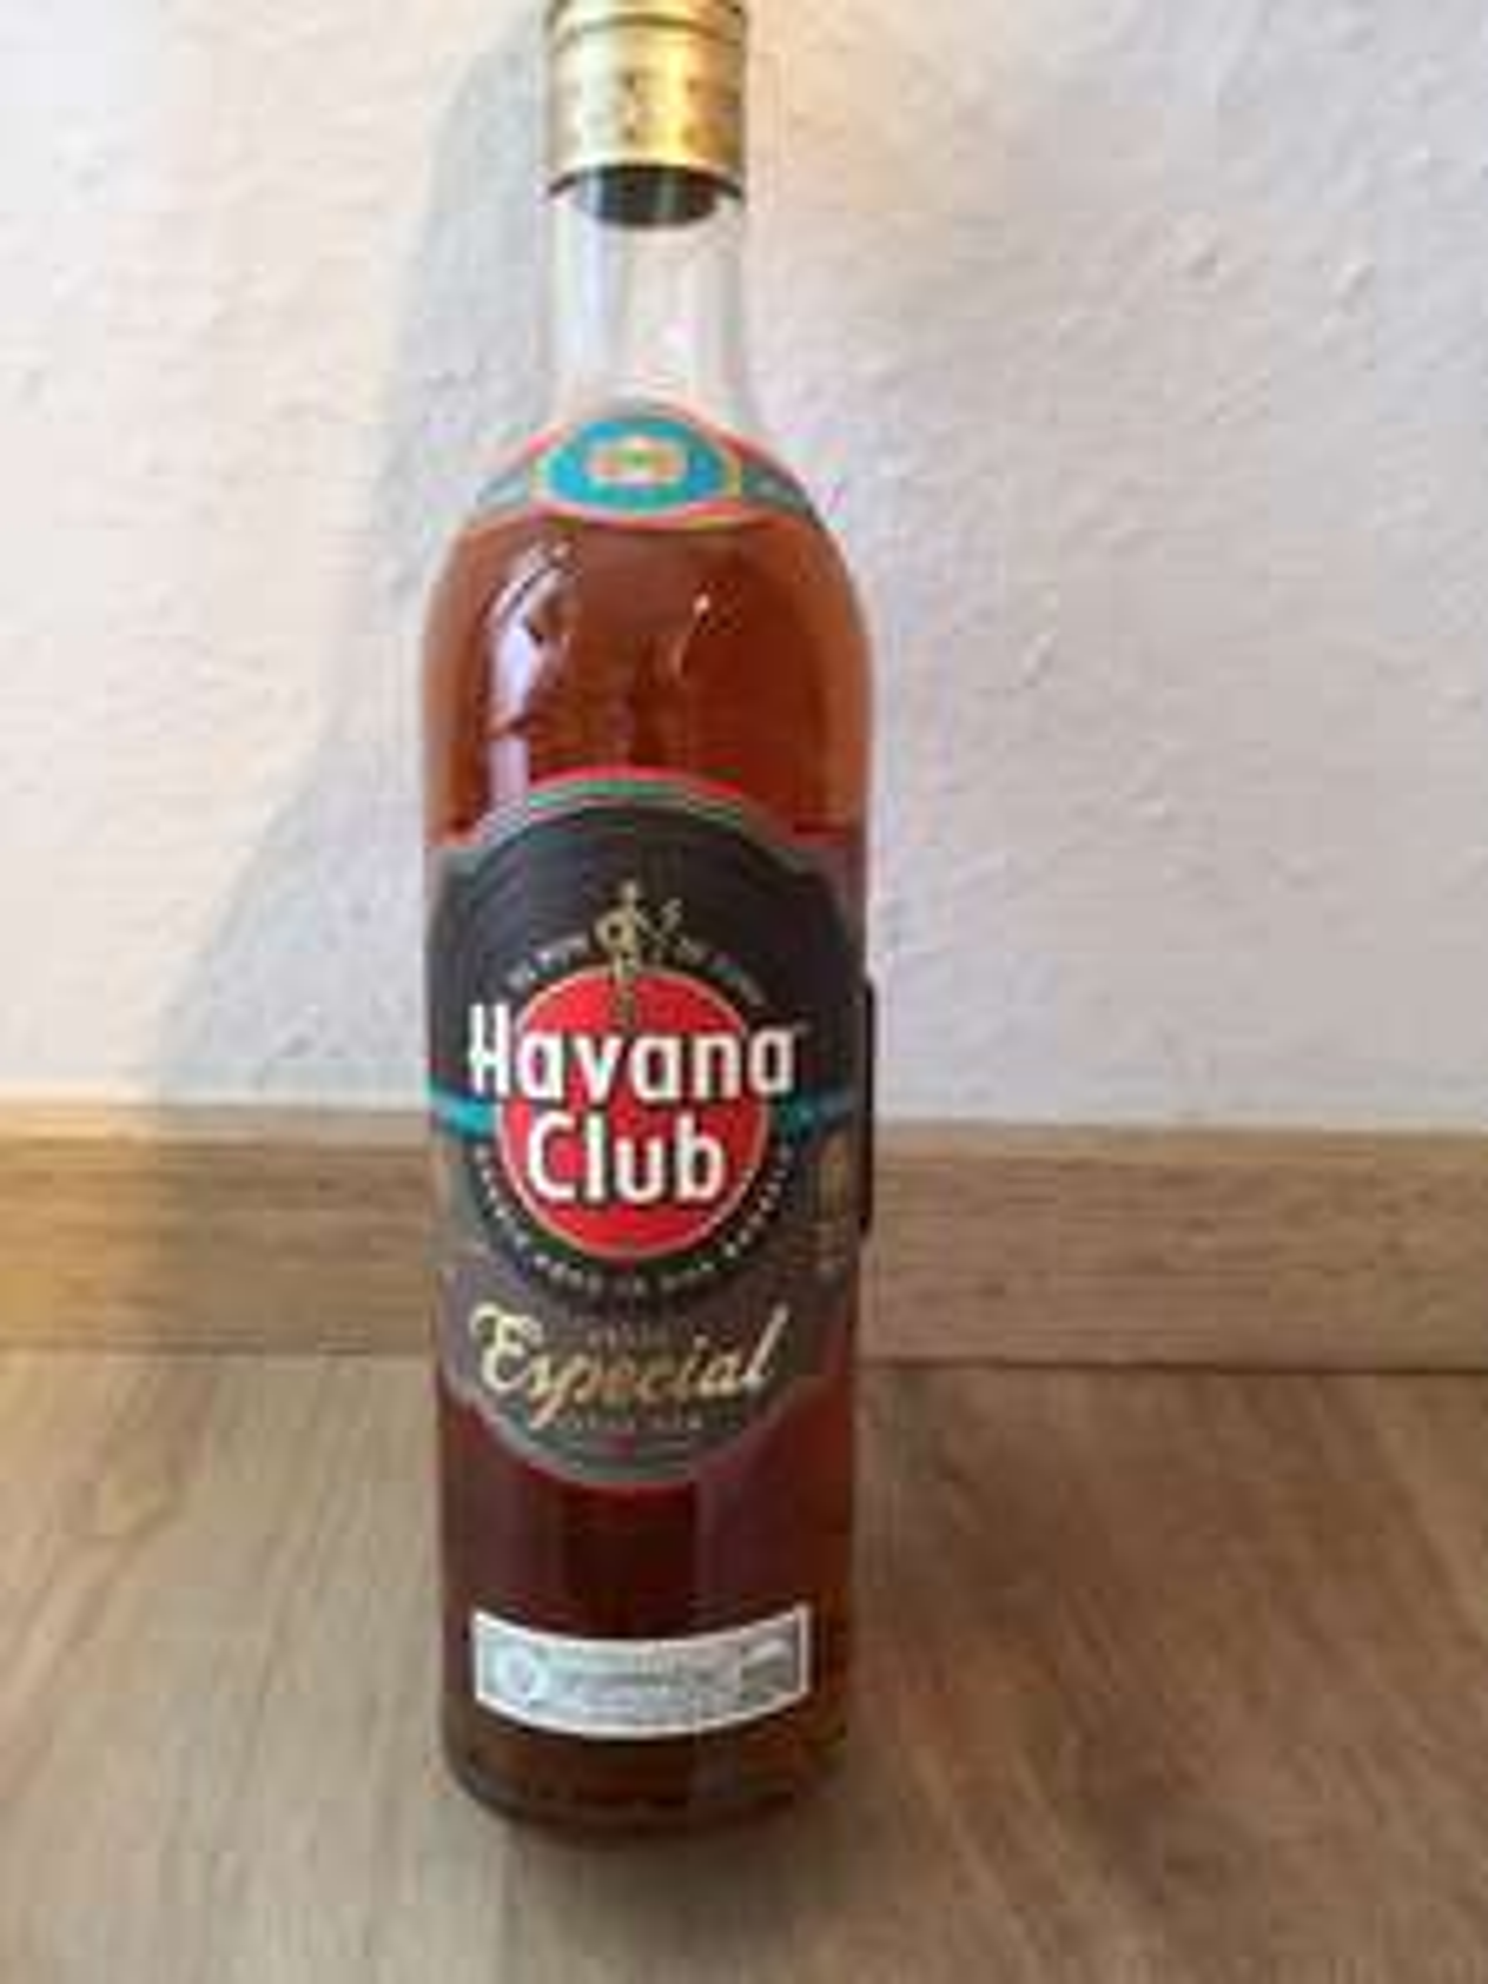 Lokal? NETTO DRESDEN 0,7l Havana Club Especial 10,99